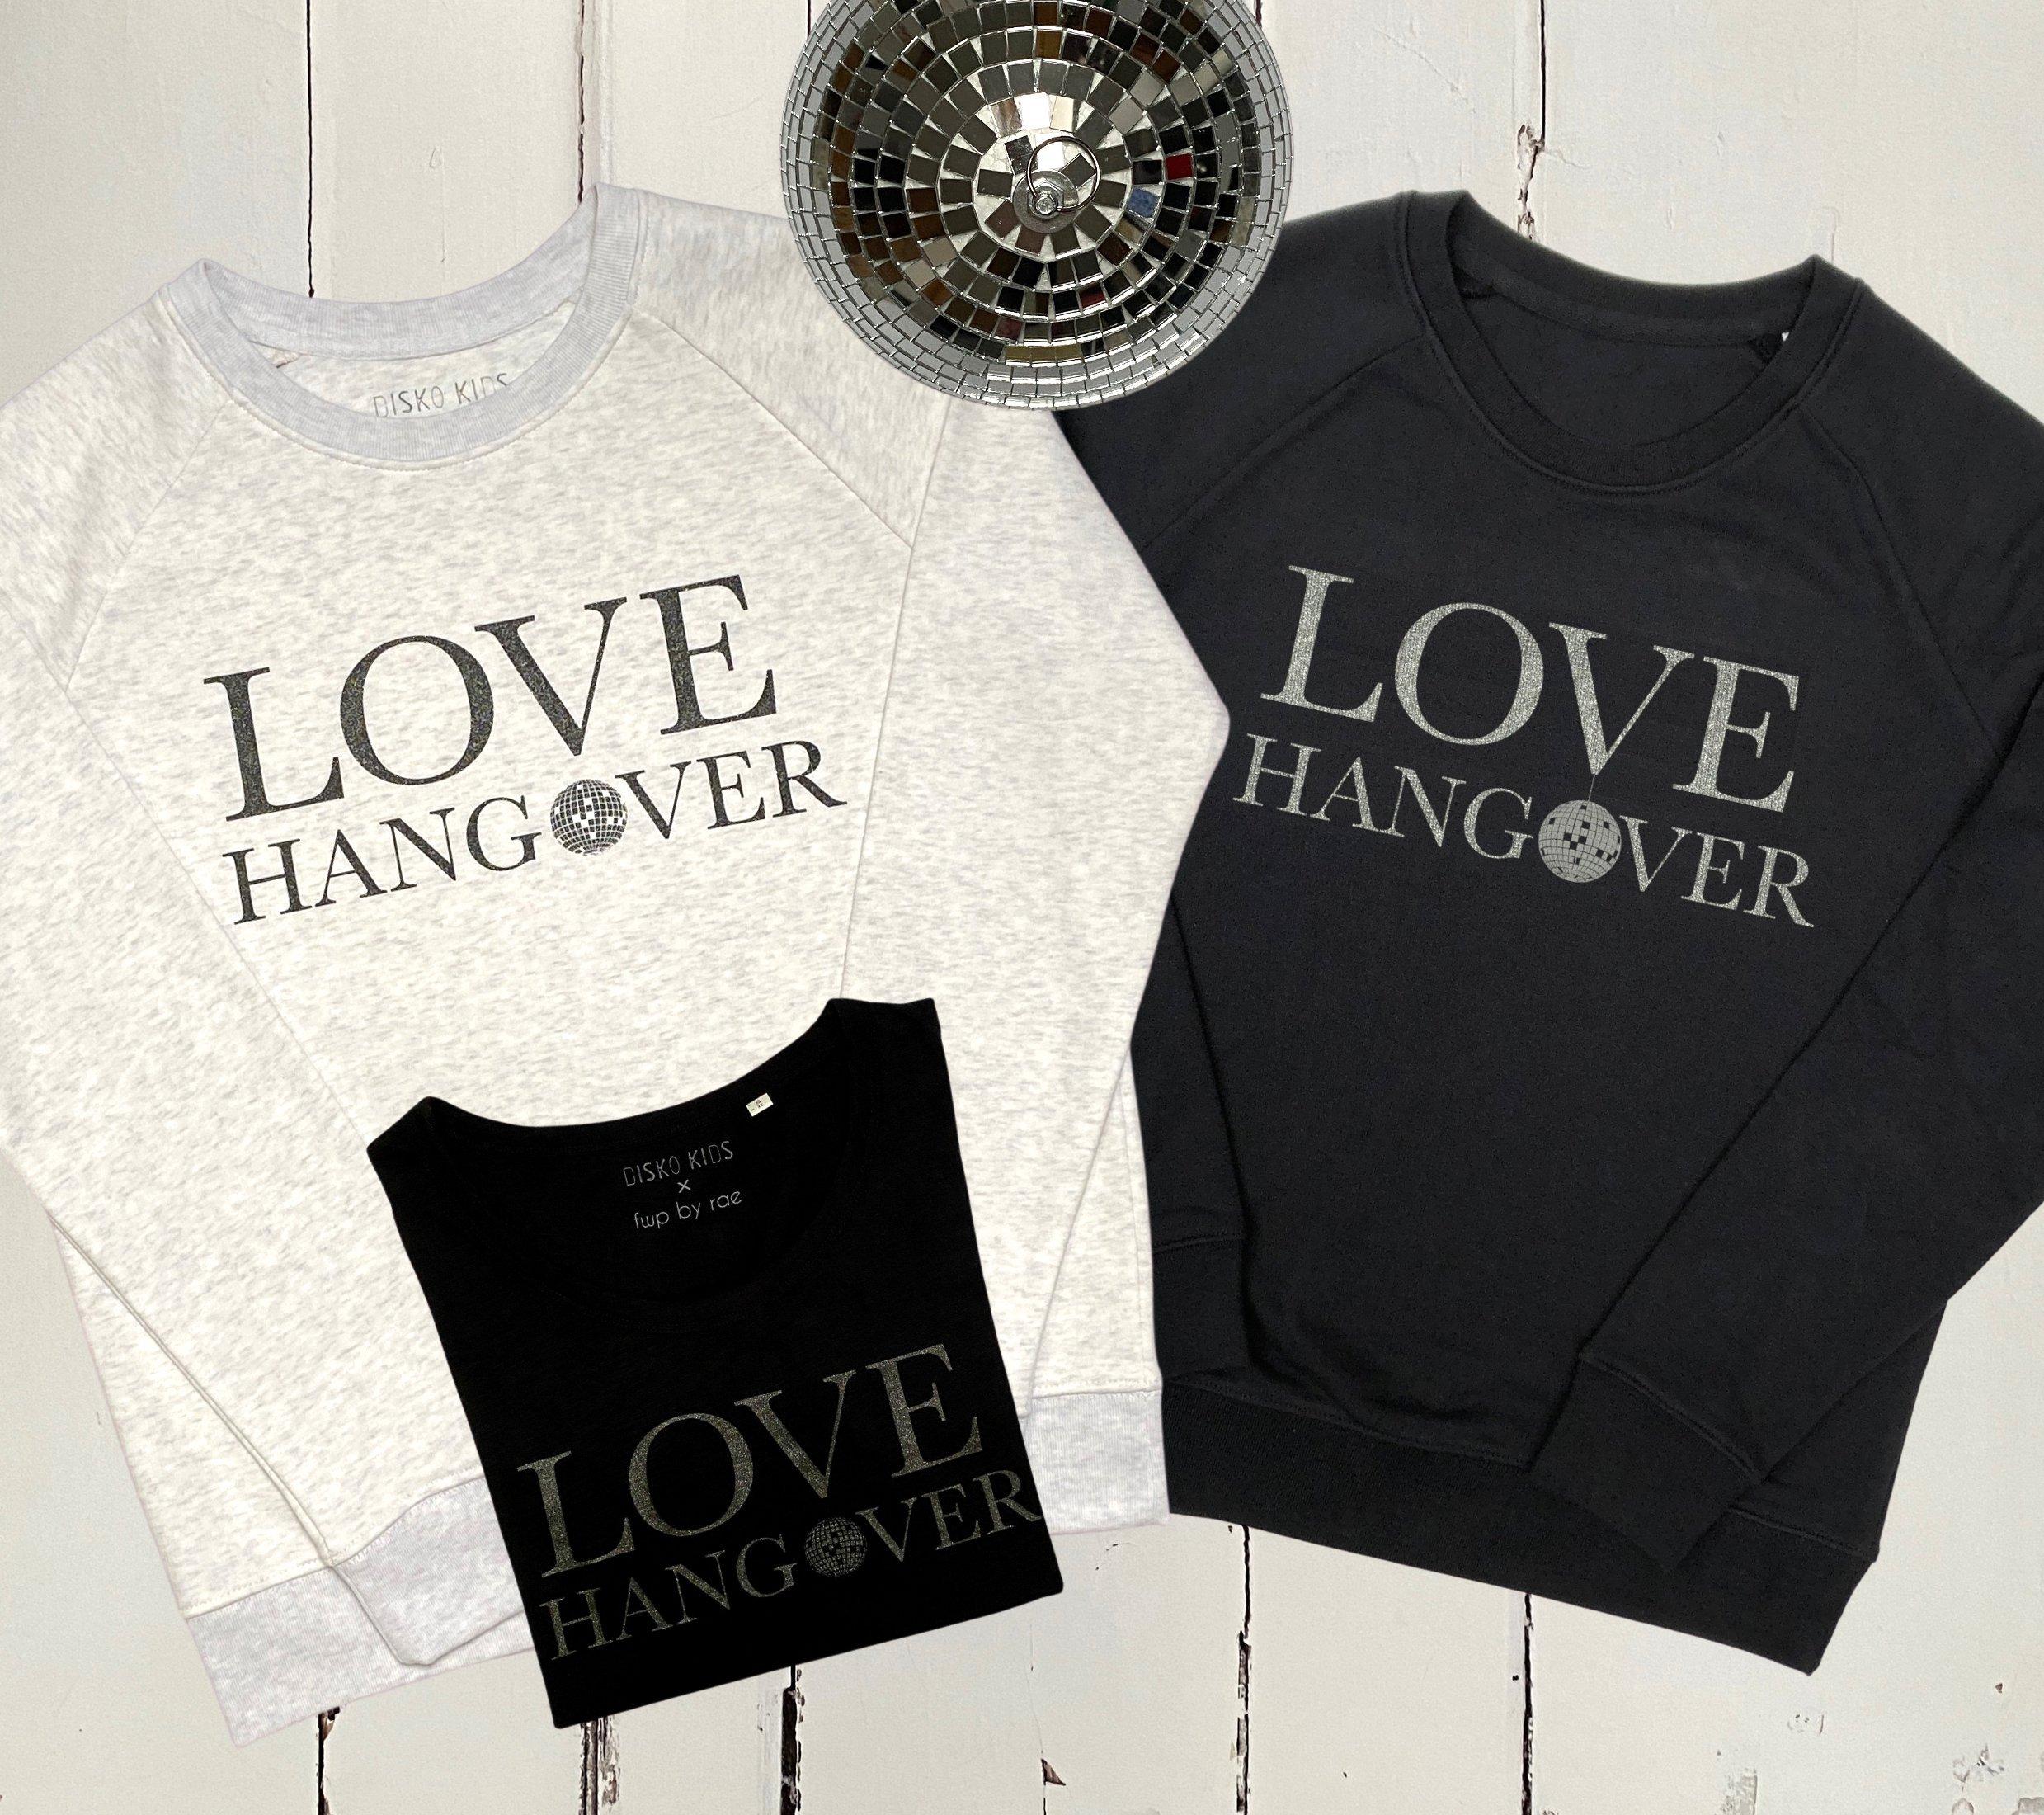 LOVE HANGOVER COLLABORATION